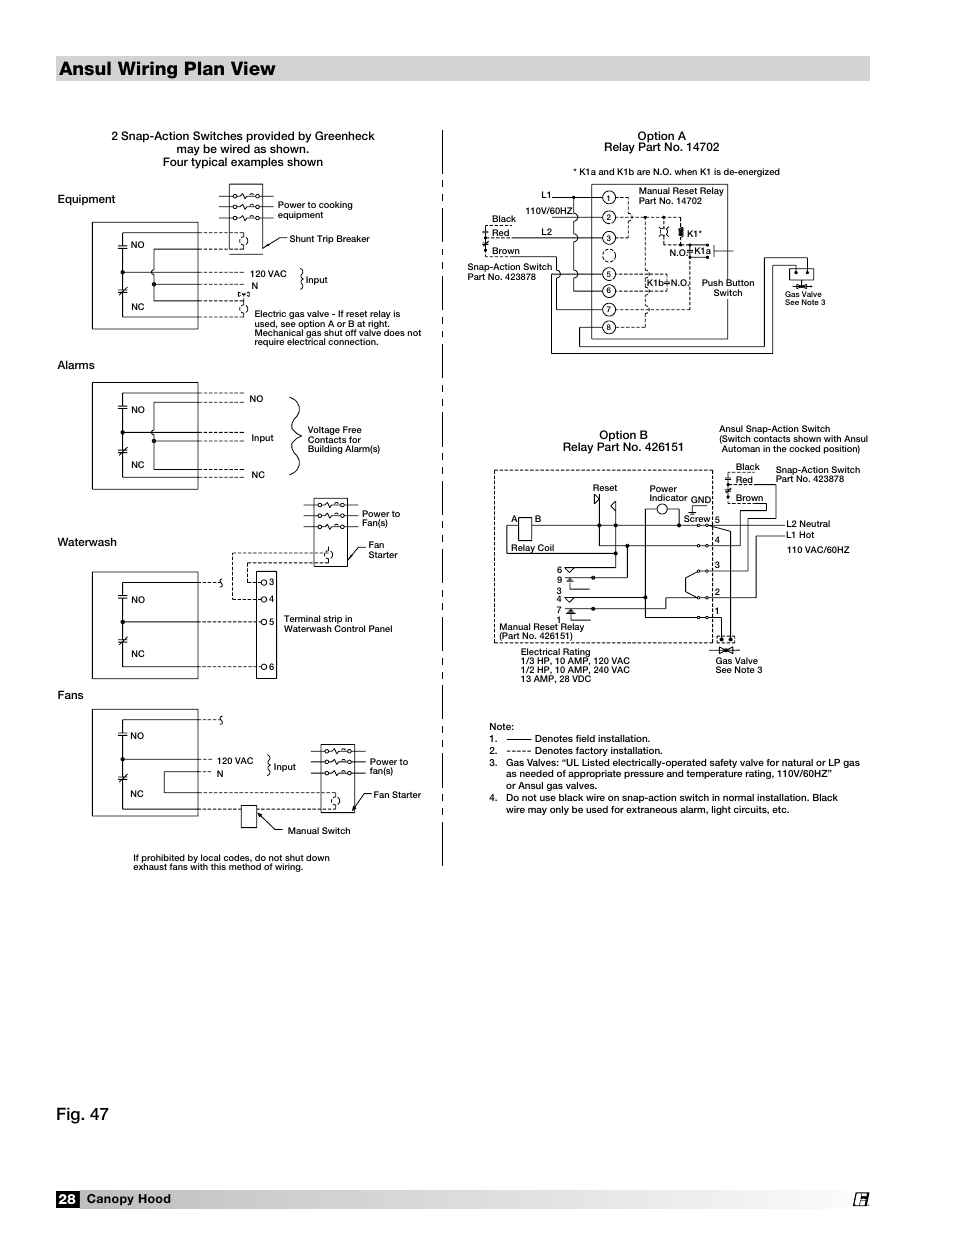 Robertshaw 9701i2 Wiring Diagram Free Download 9420 32 Images Coleman Furnace At